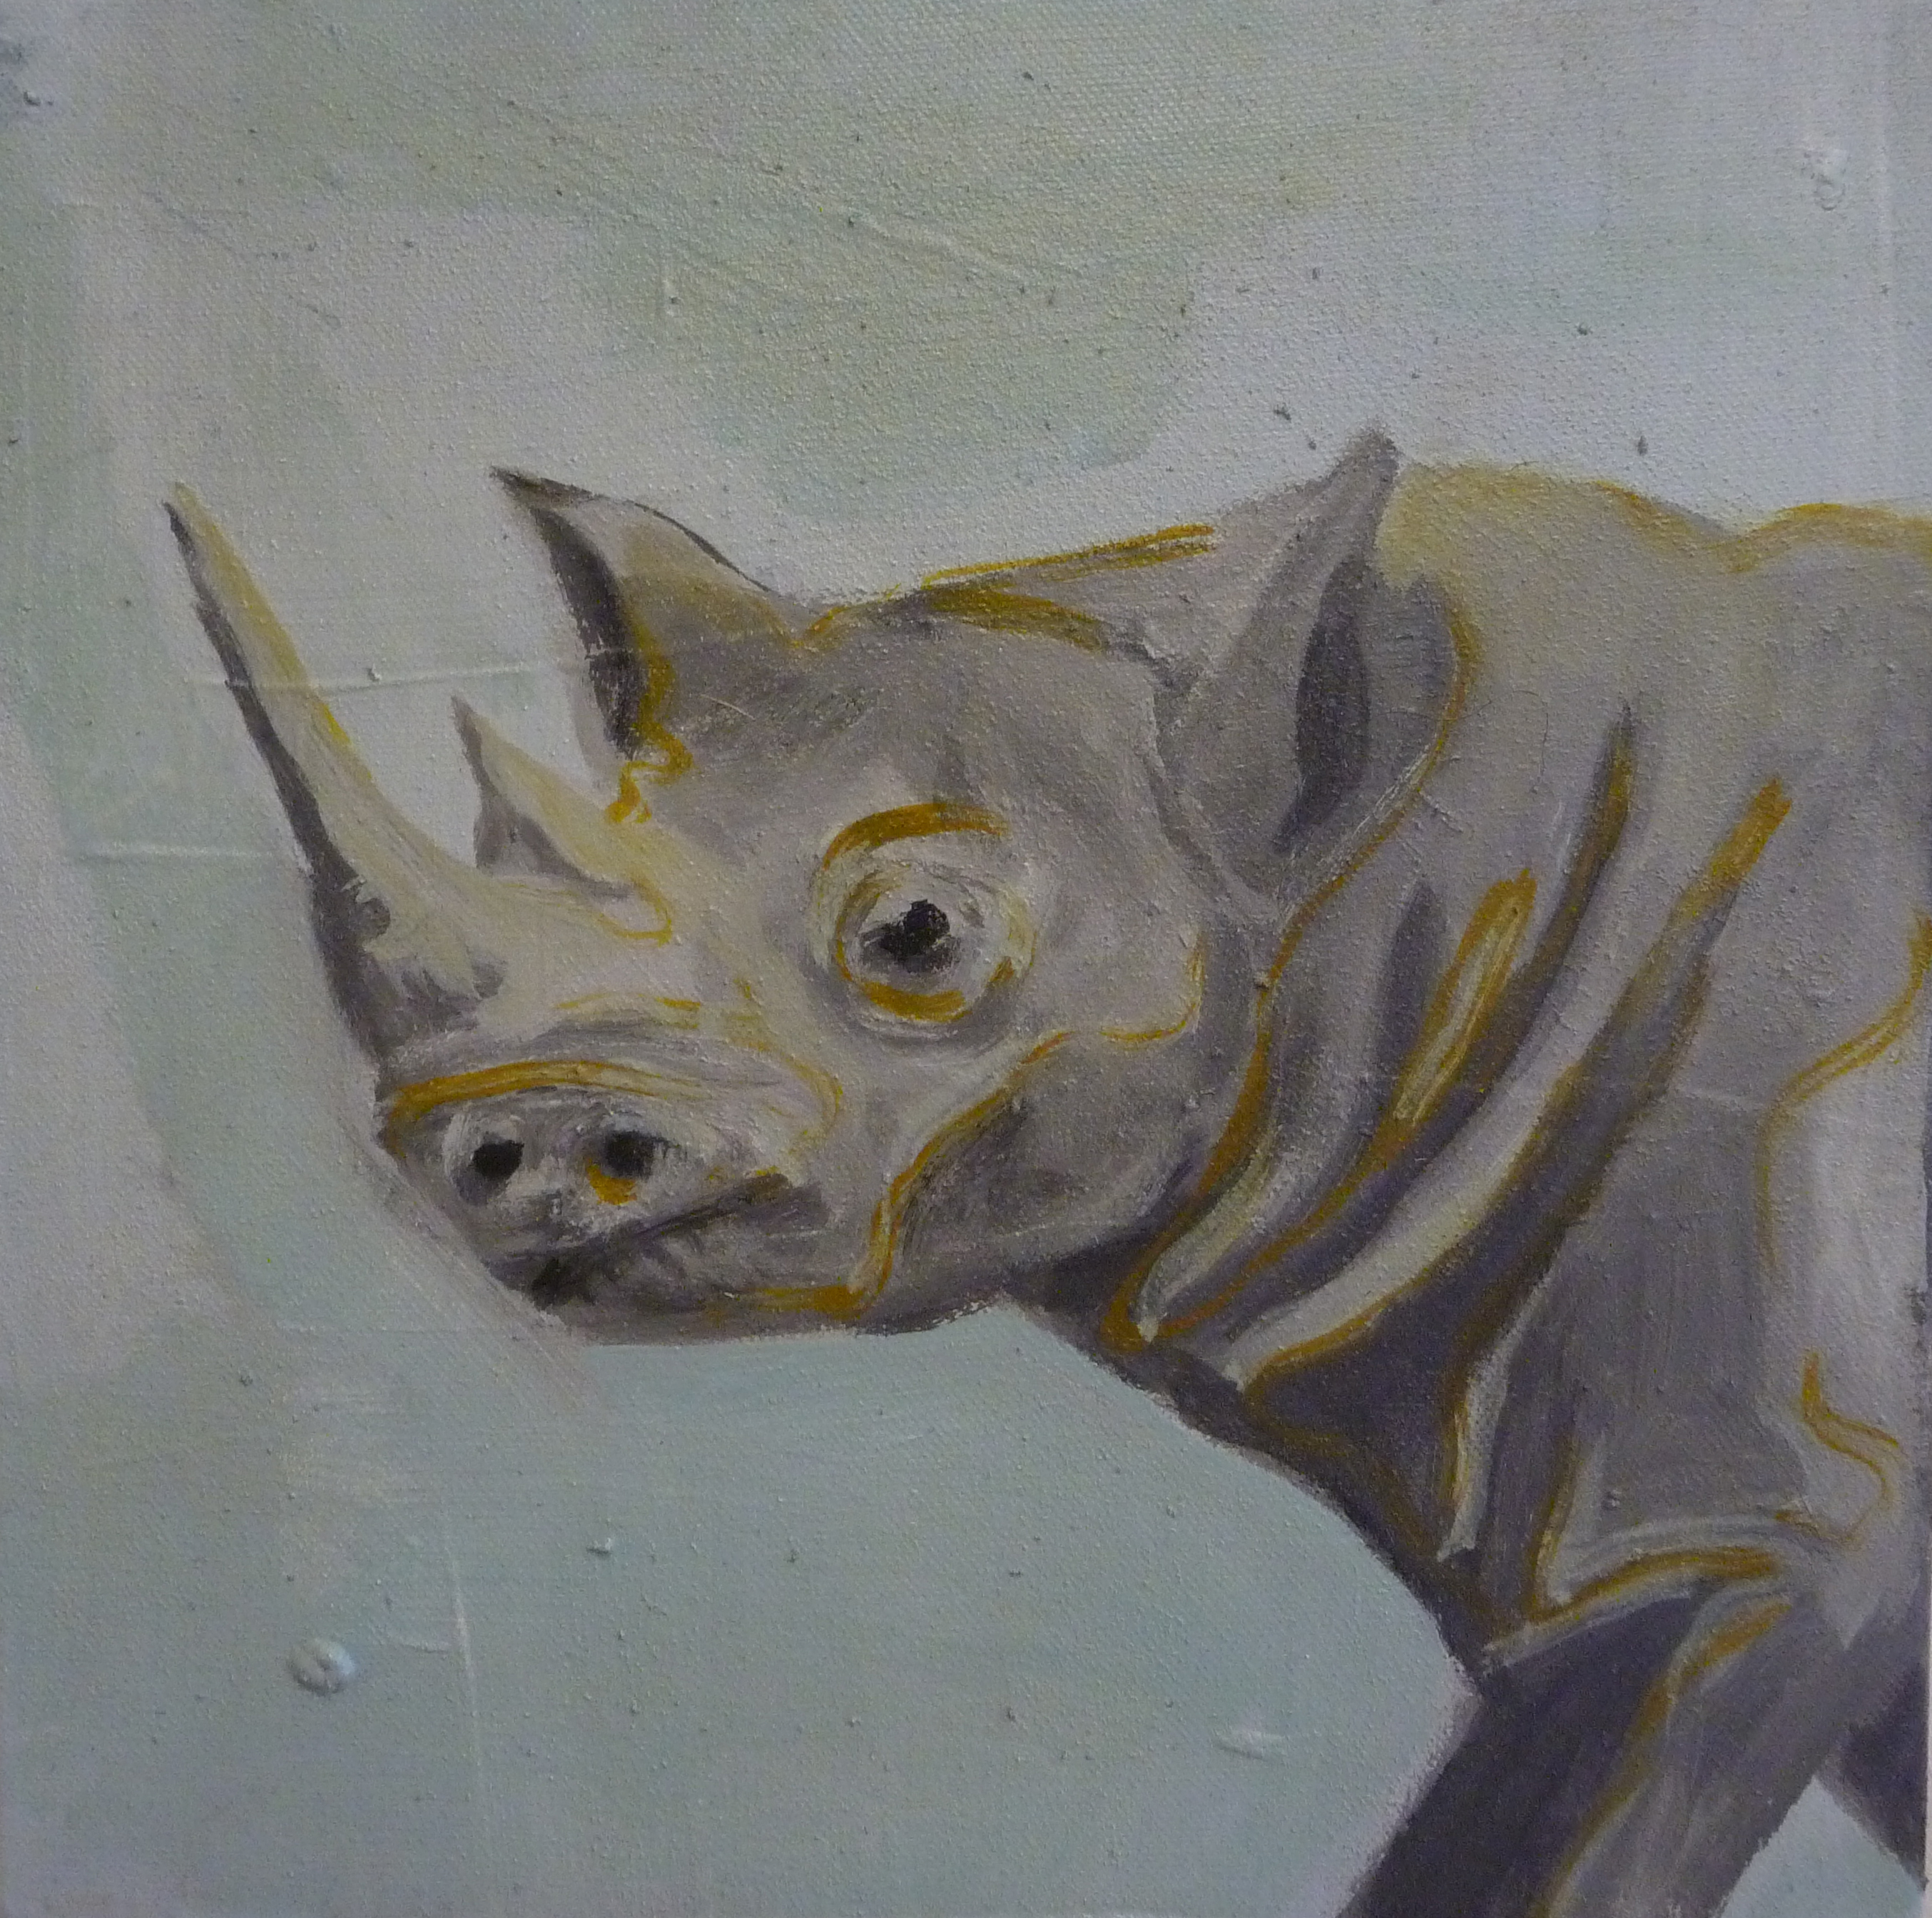 Rhino, 30 x 30 cm, 2011